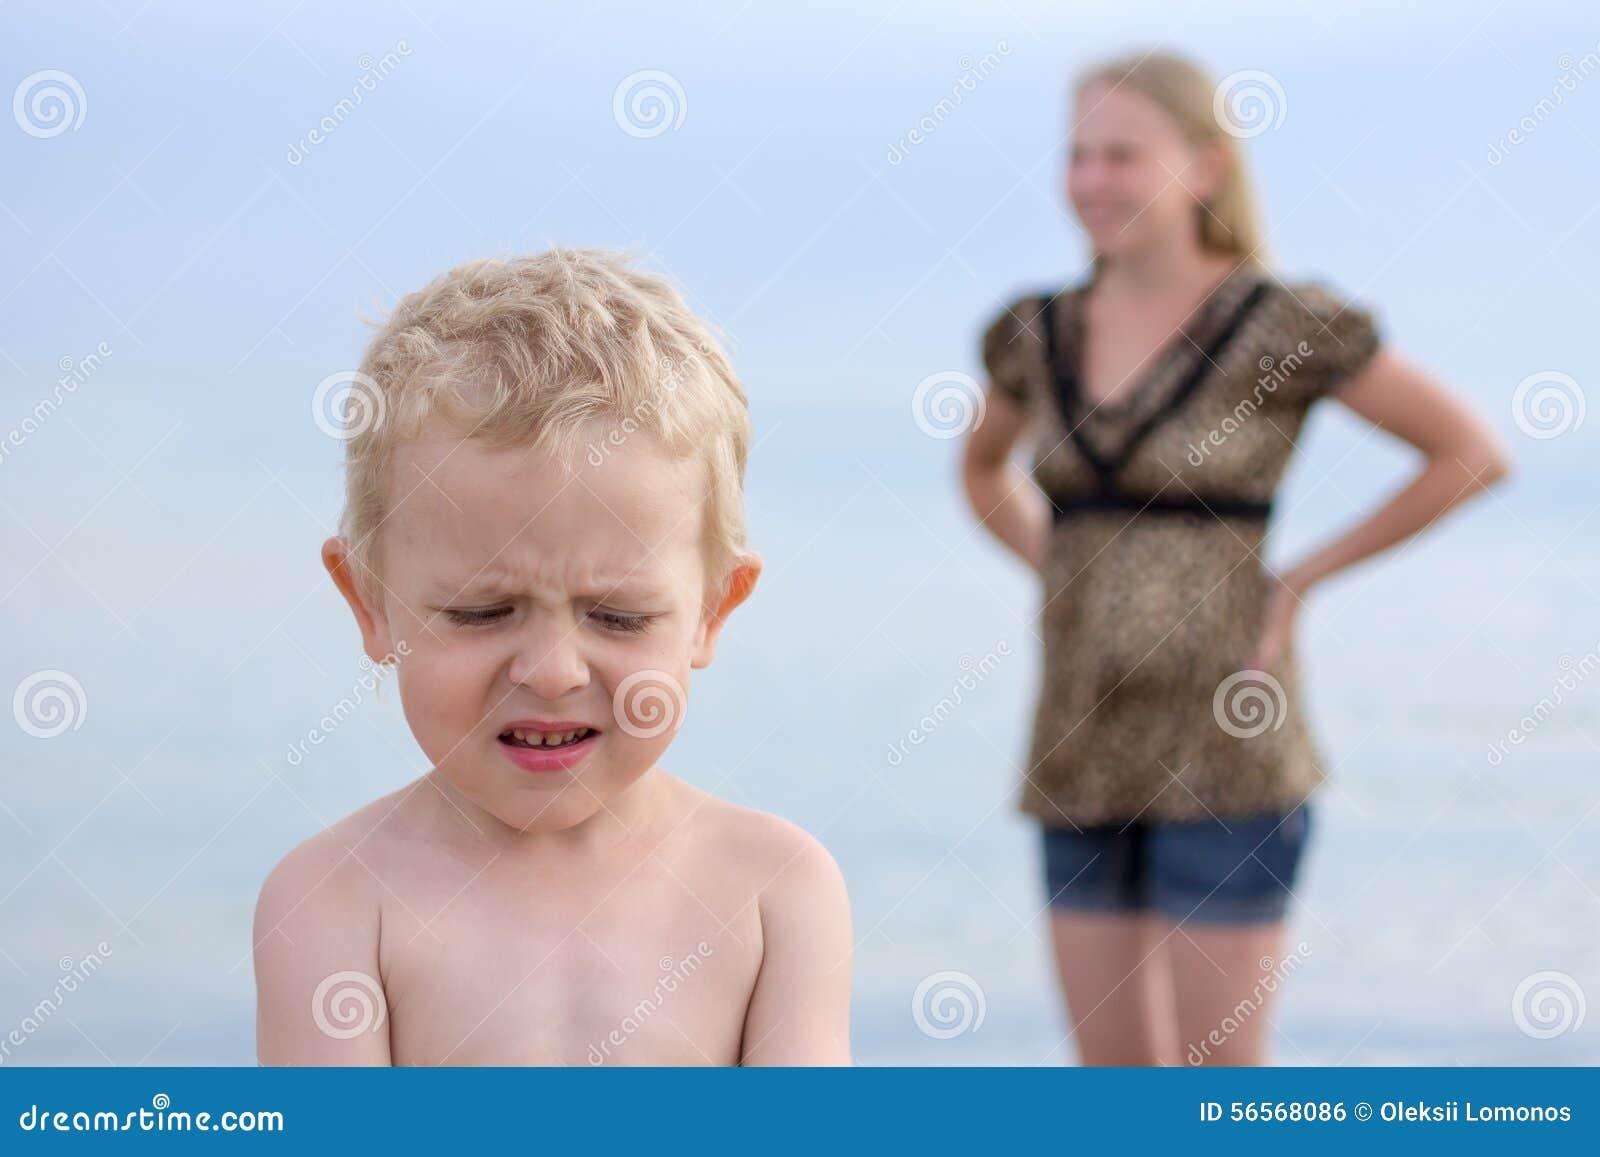 Download Το Mom επέπληξε το αγόρι και το αγόρι βλάπτεται μακριά Στοκ Εικόνες - εικόνα από επιπληγμένος, προσβολή: 56568086